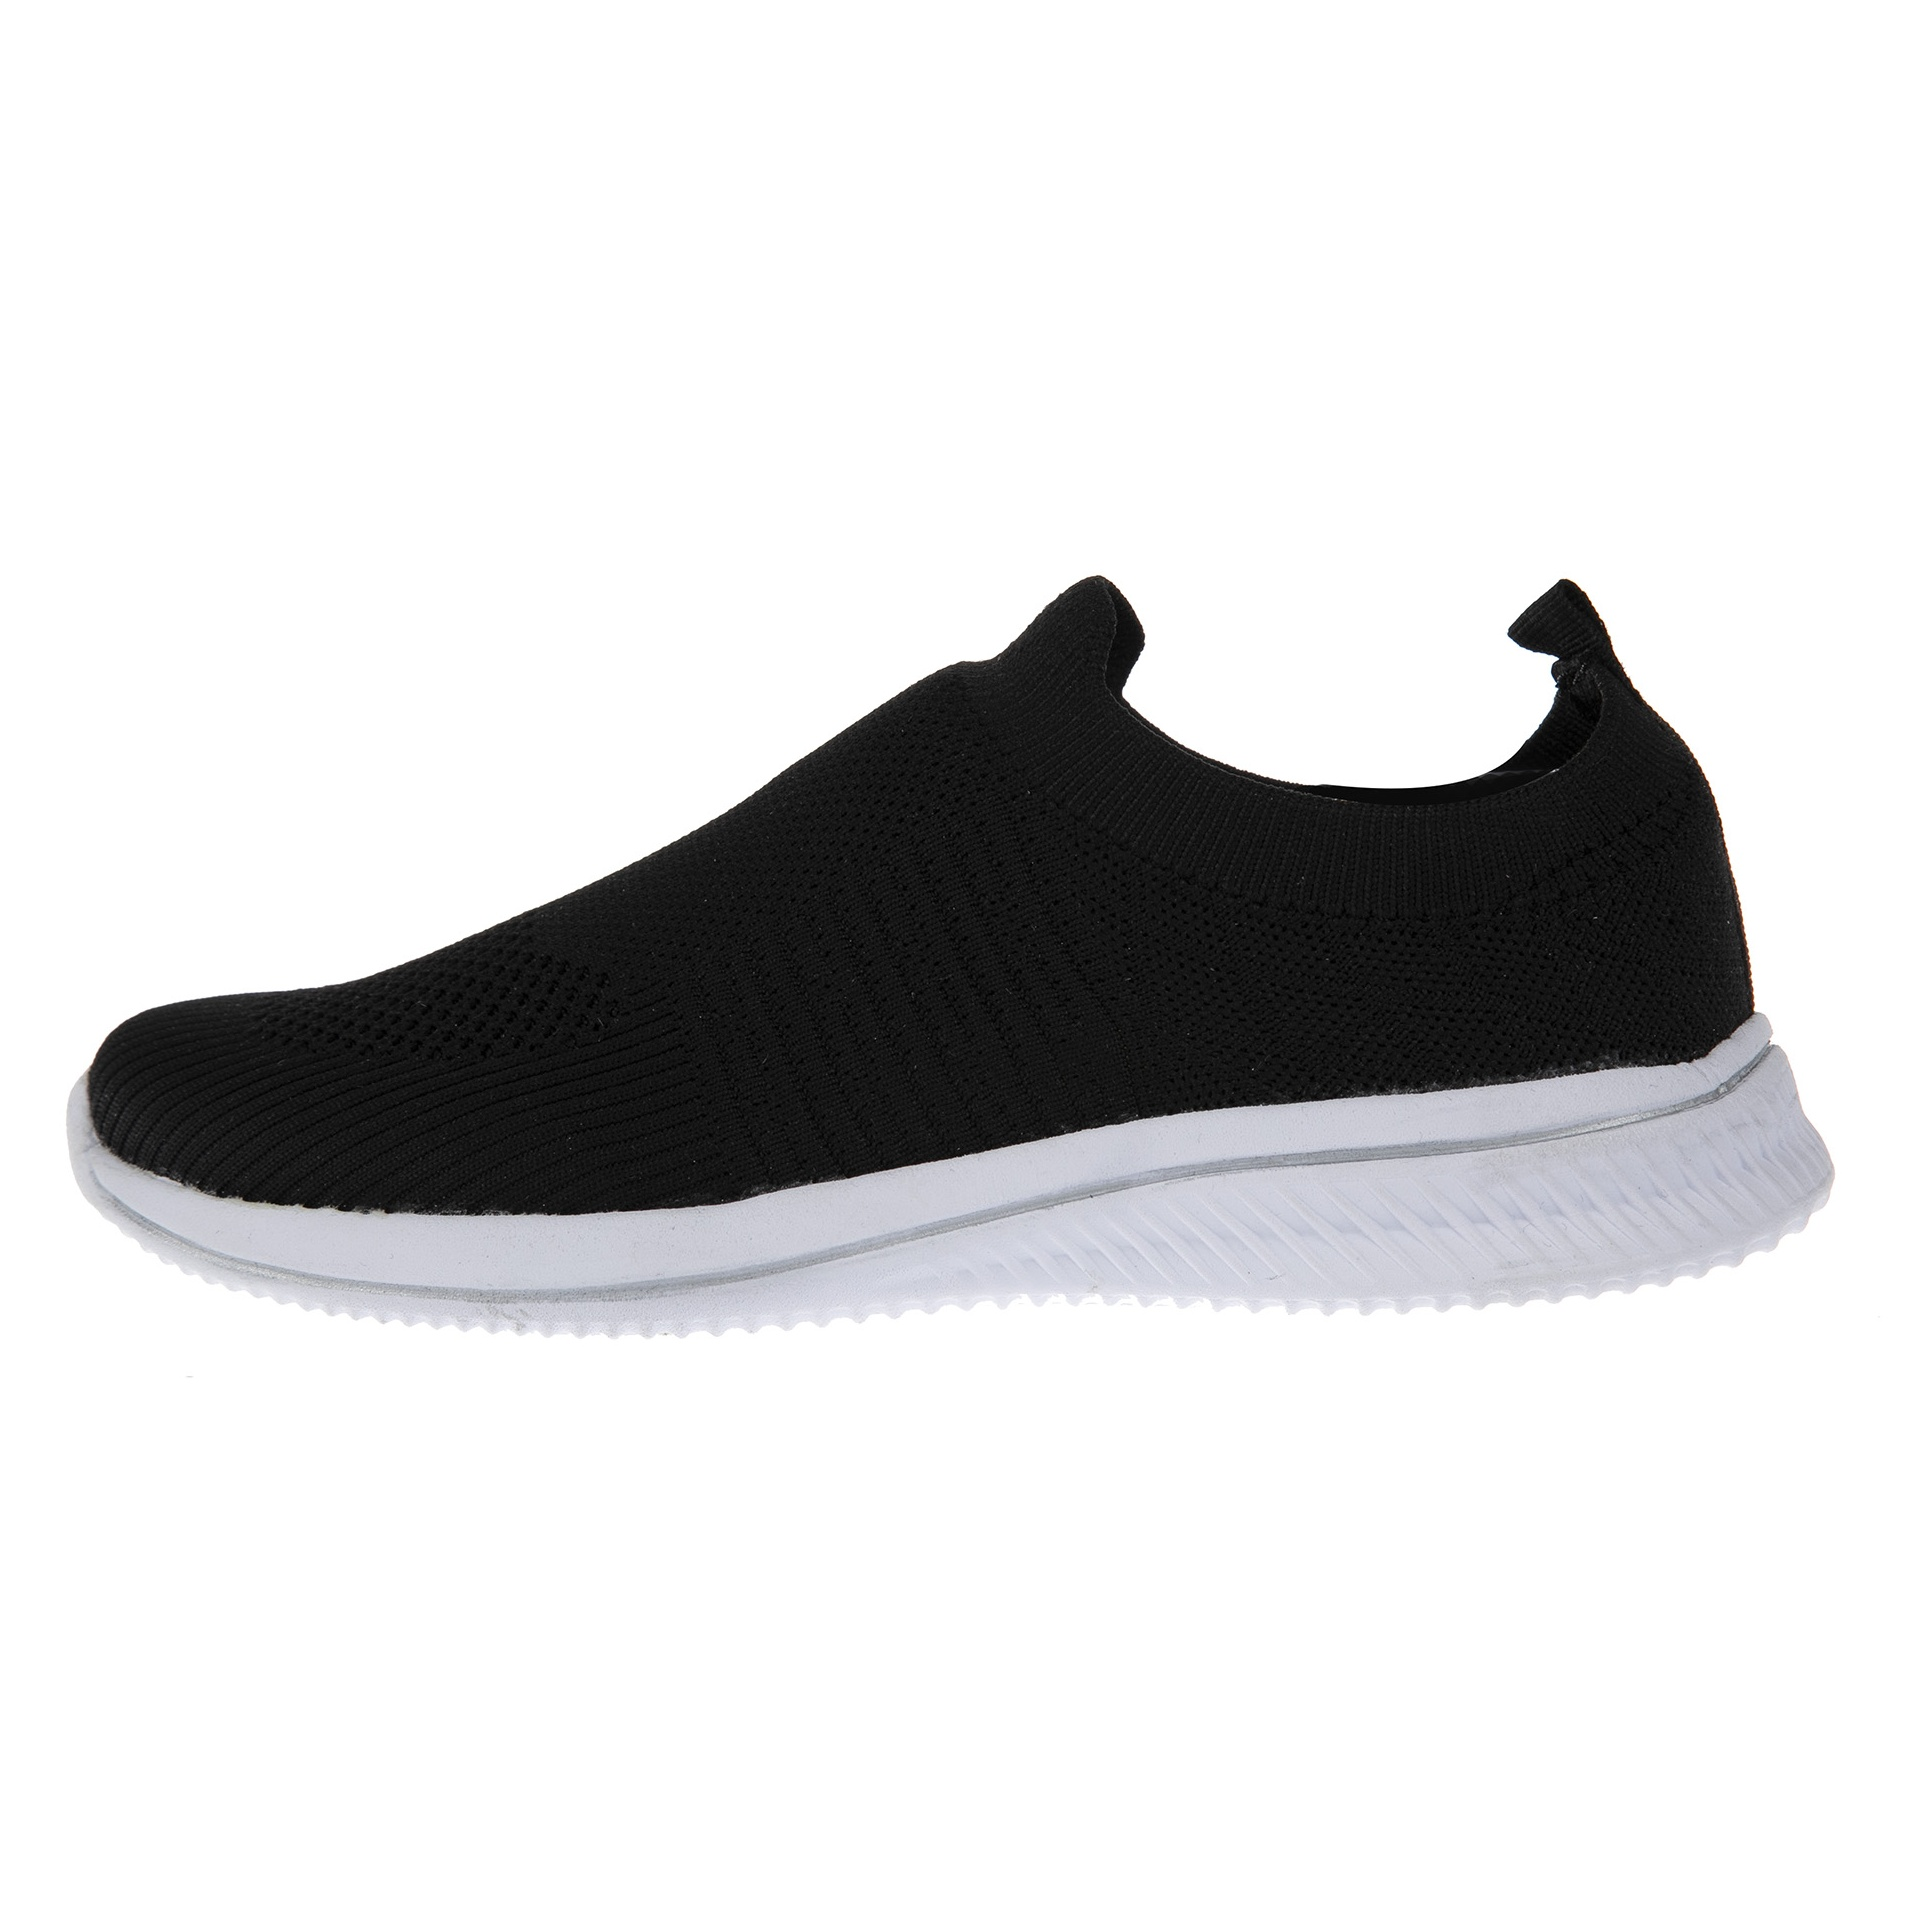 کفش راحتی زنانه لیموطب کد Z201B